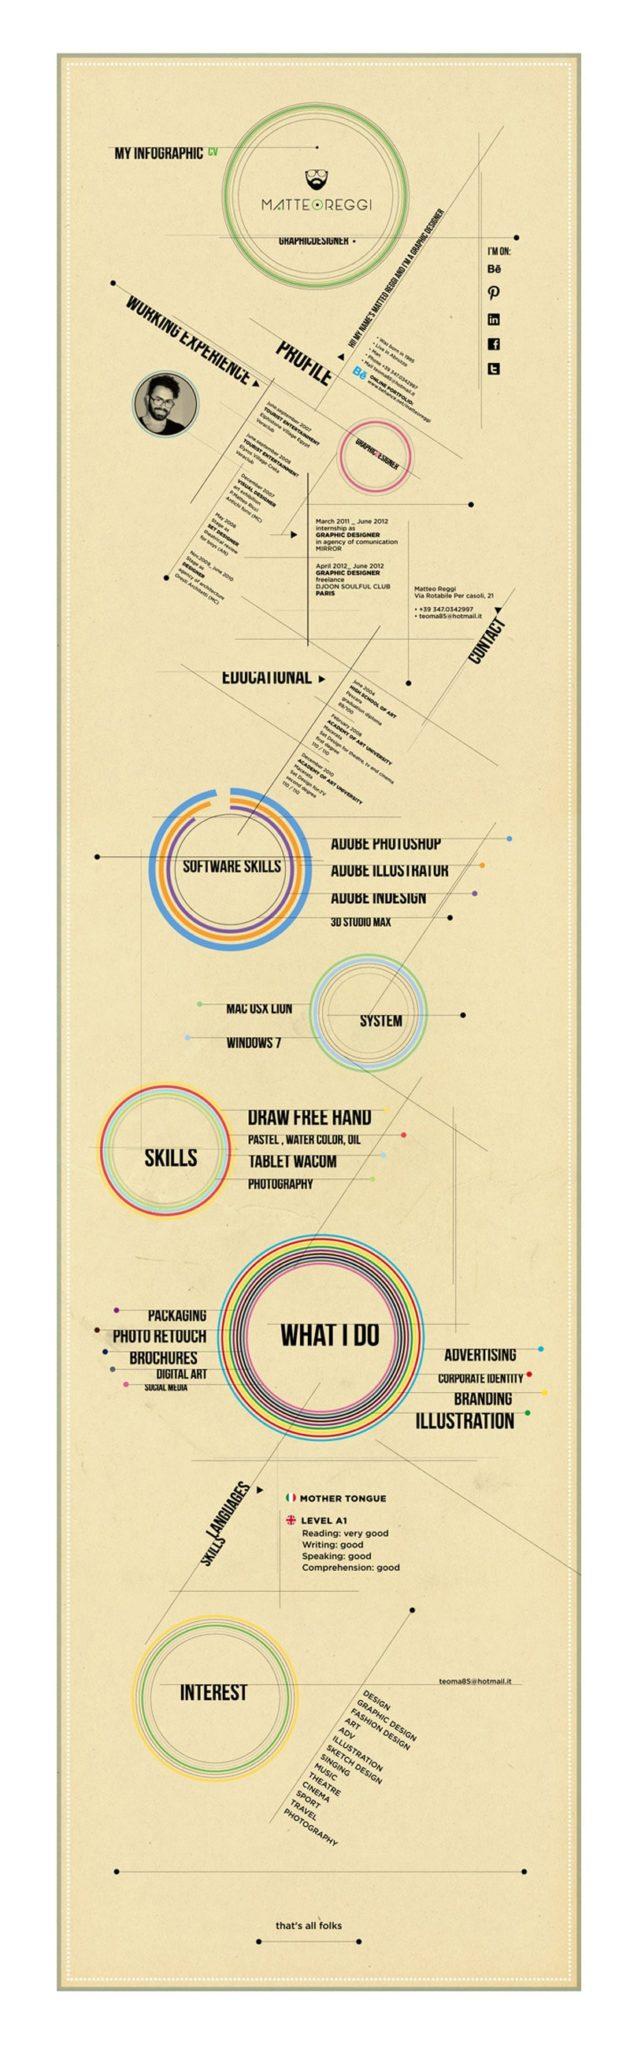 indesign cv resume inspiration infographic matteo reggi